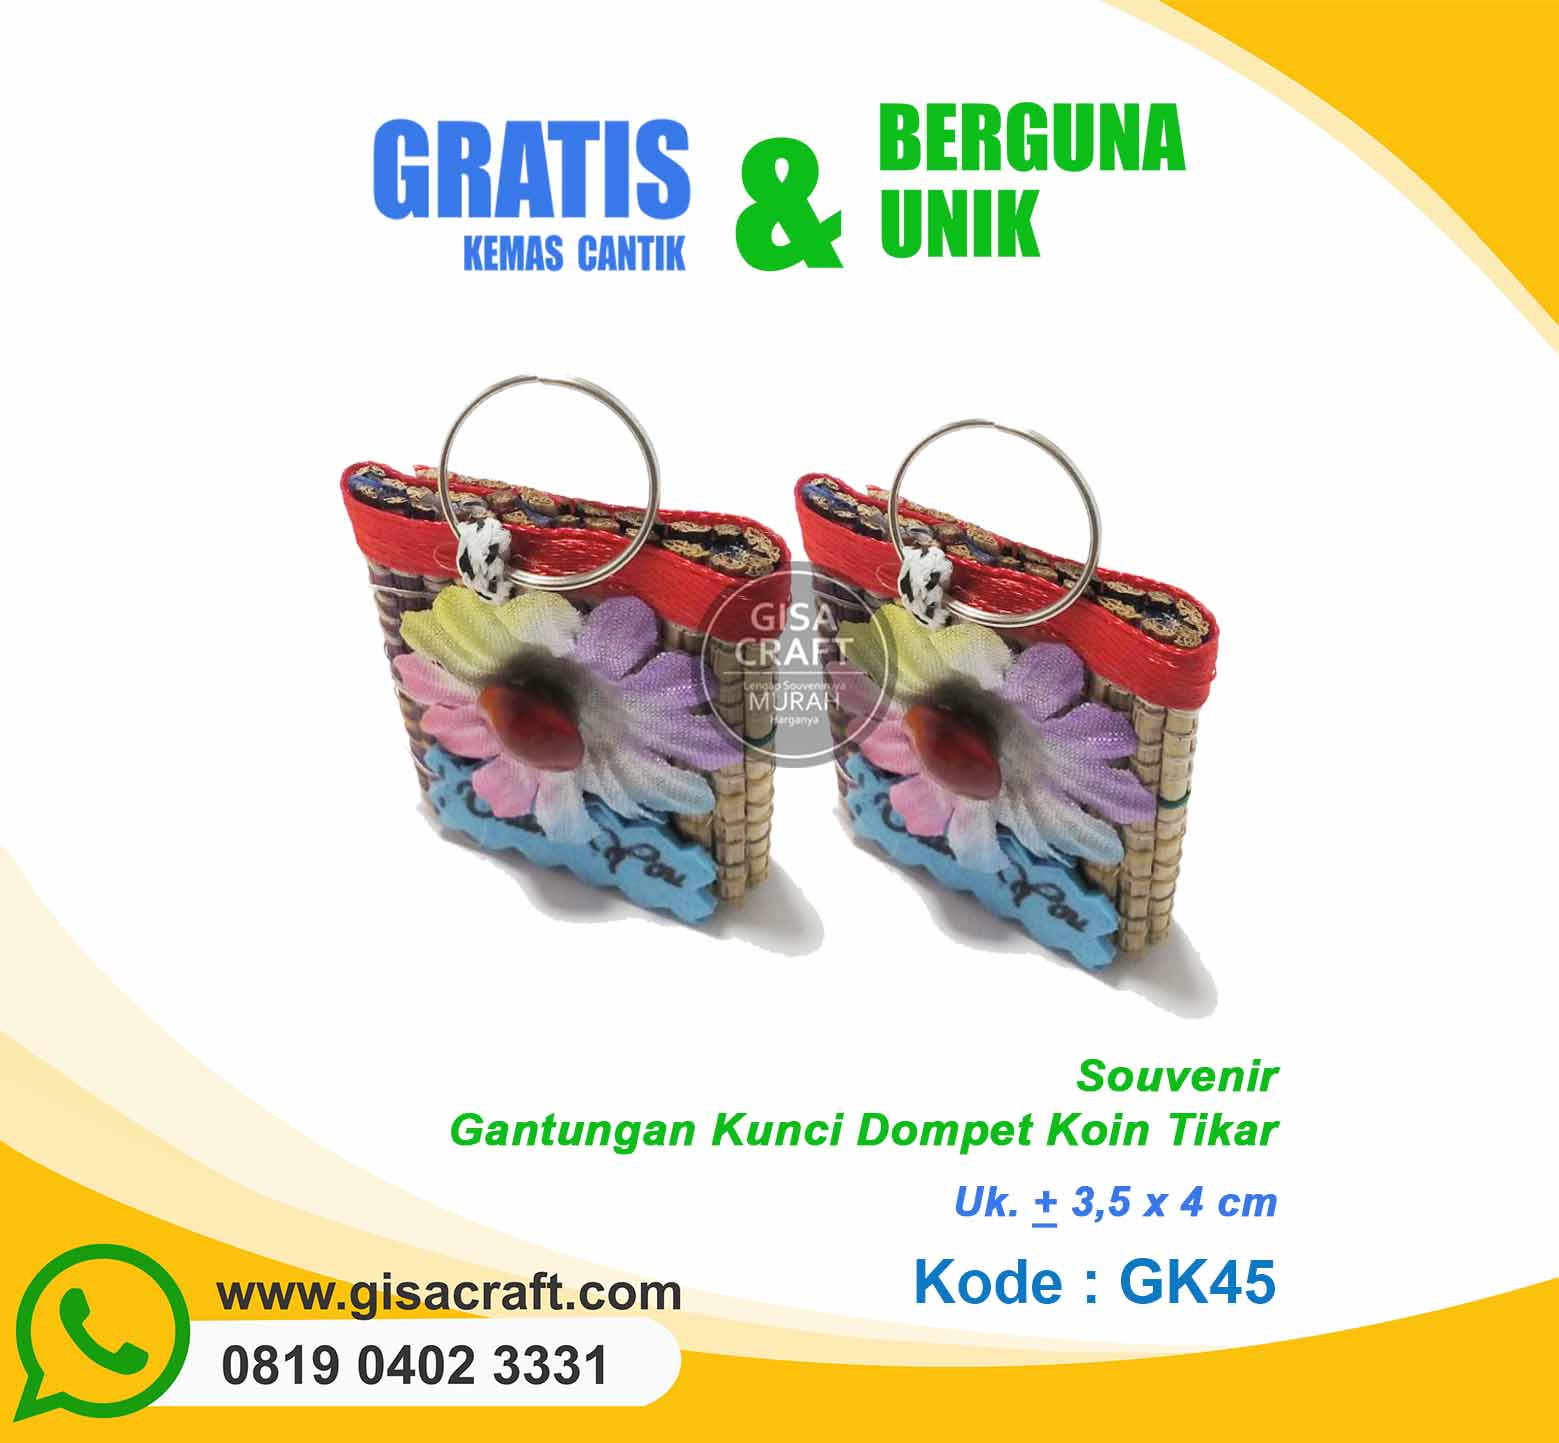 Souvenir Gantungan Kunci Dompet Koin Tikat GK45